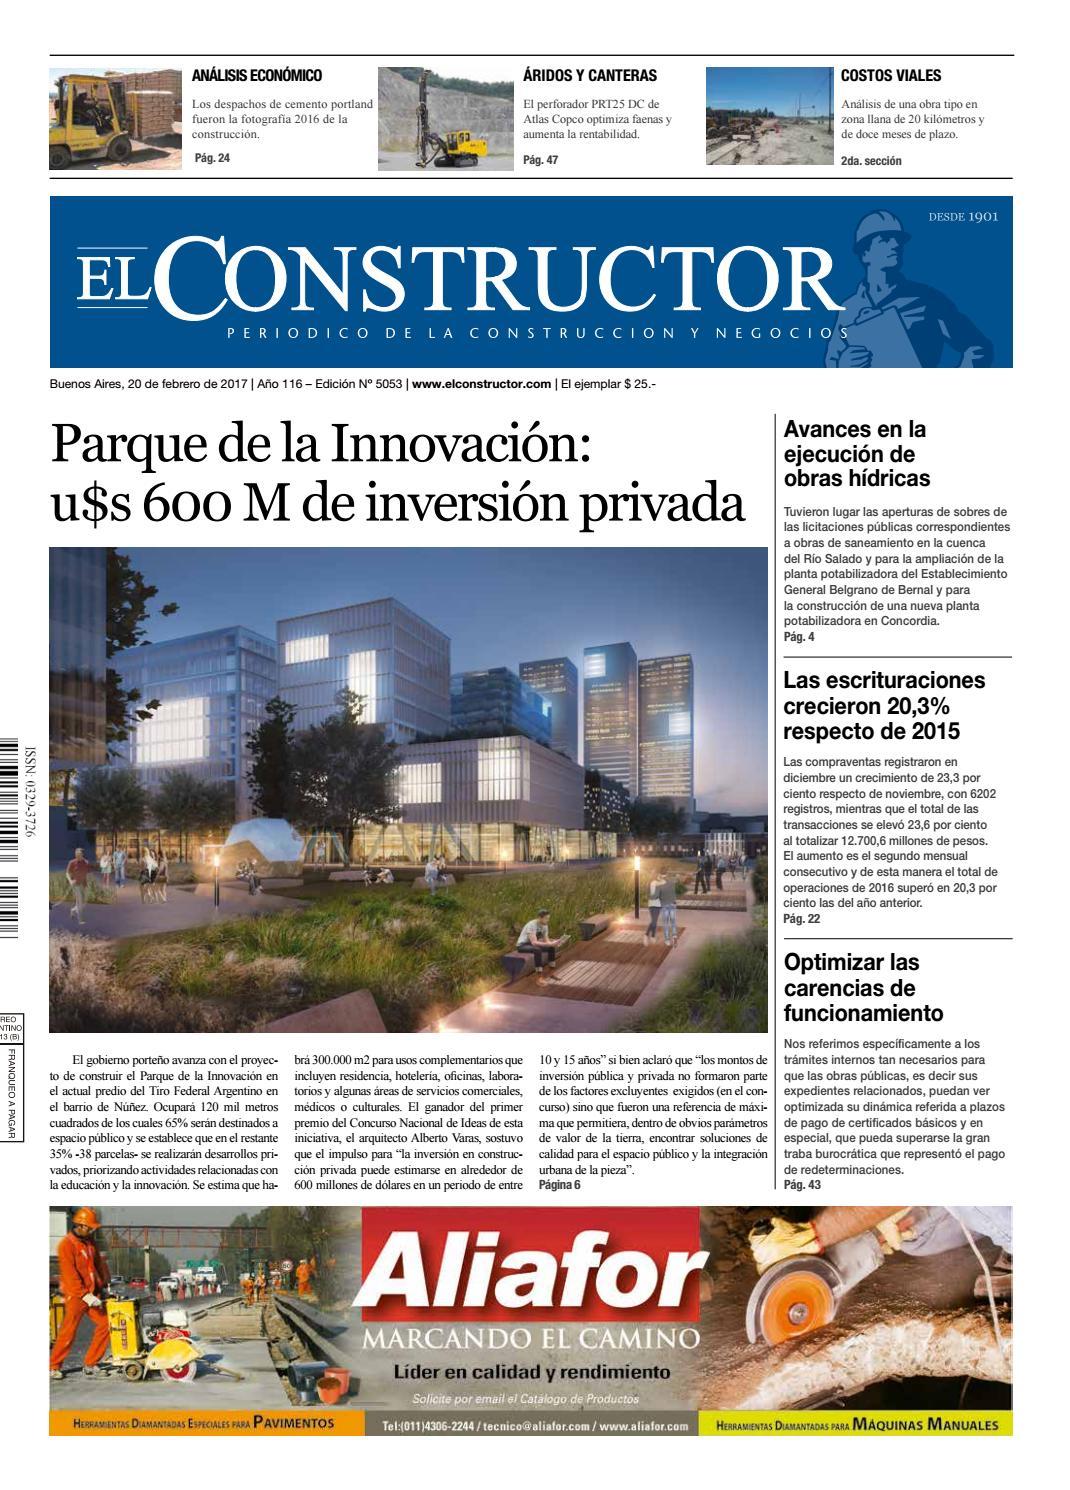 El Constructor 17 4 2017 N 5057 A O 116 By Elco Editores Issuu # Vahume Muebles De Oficina Humboldt